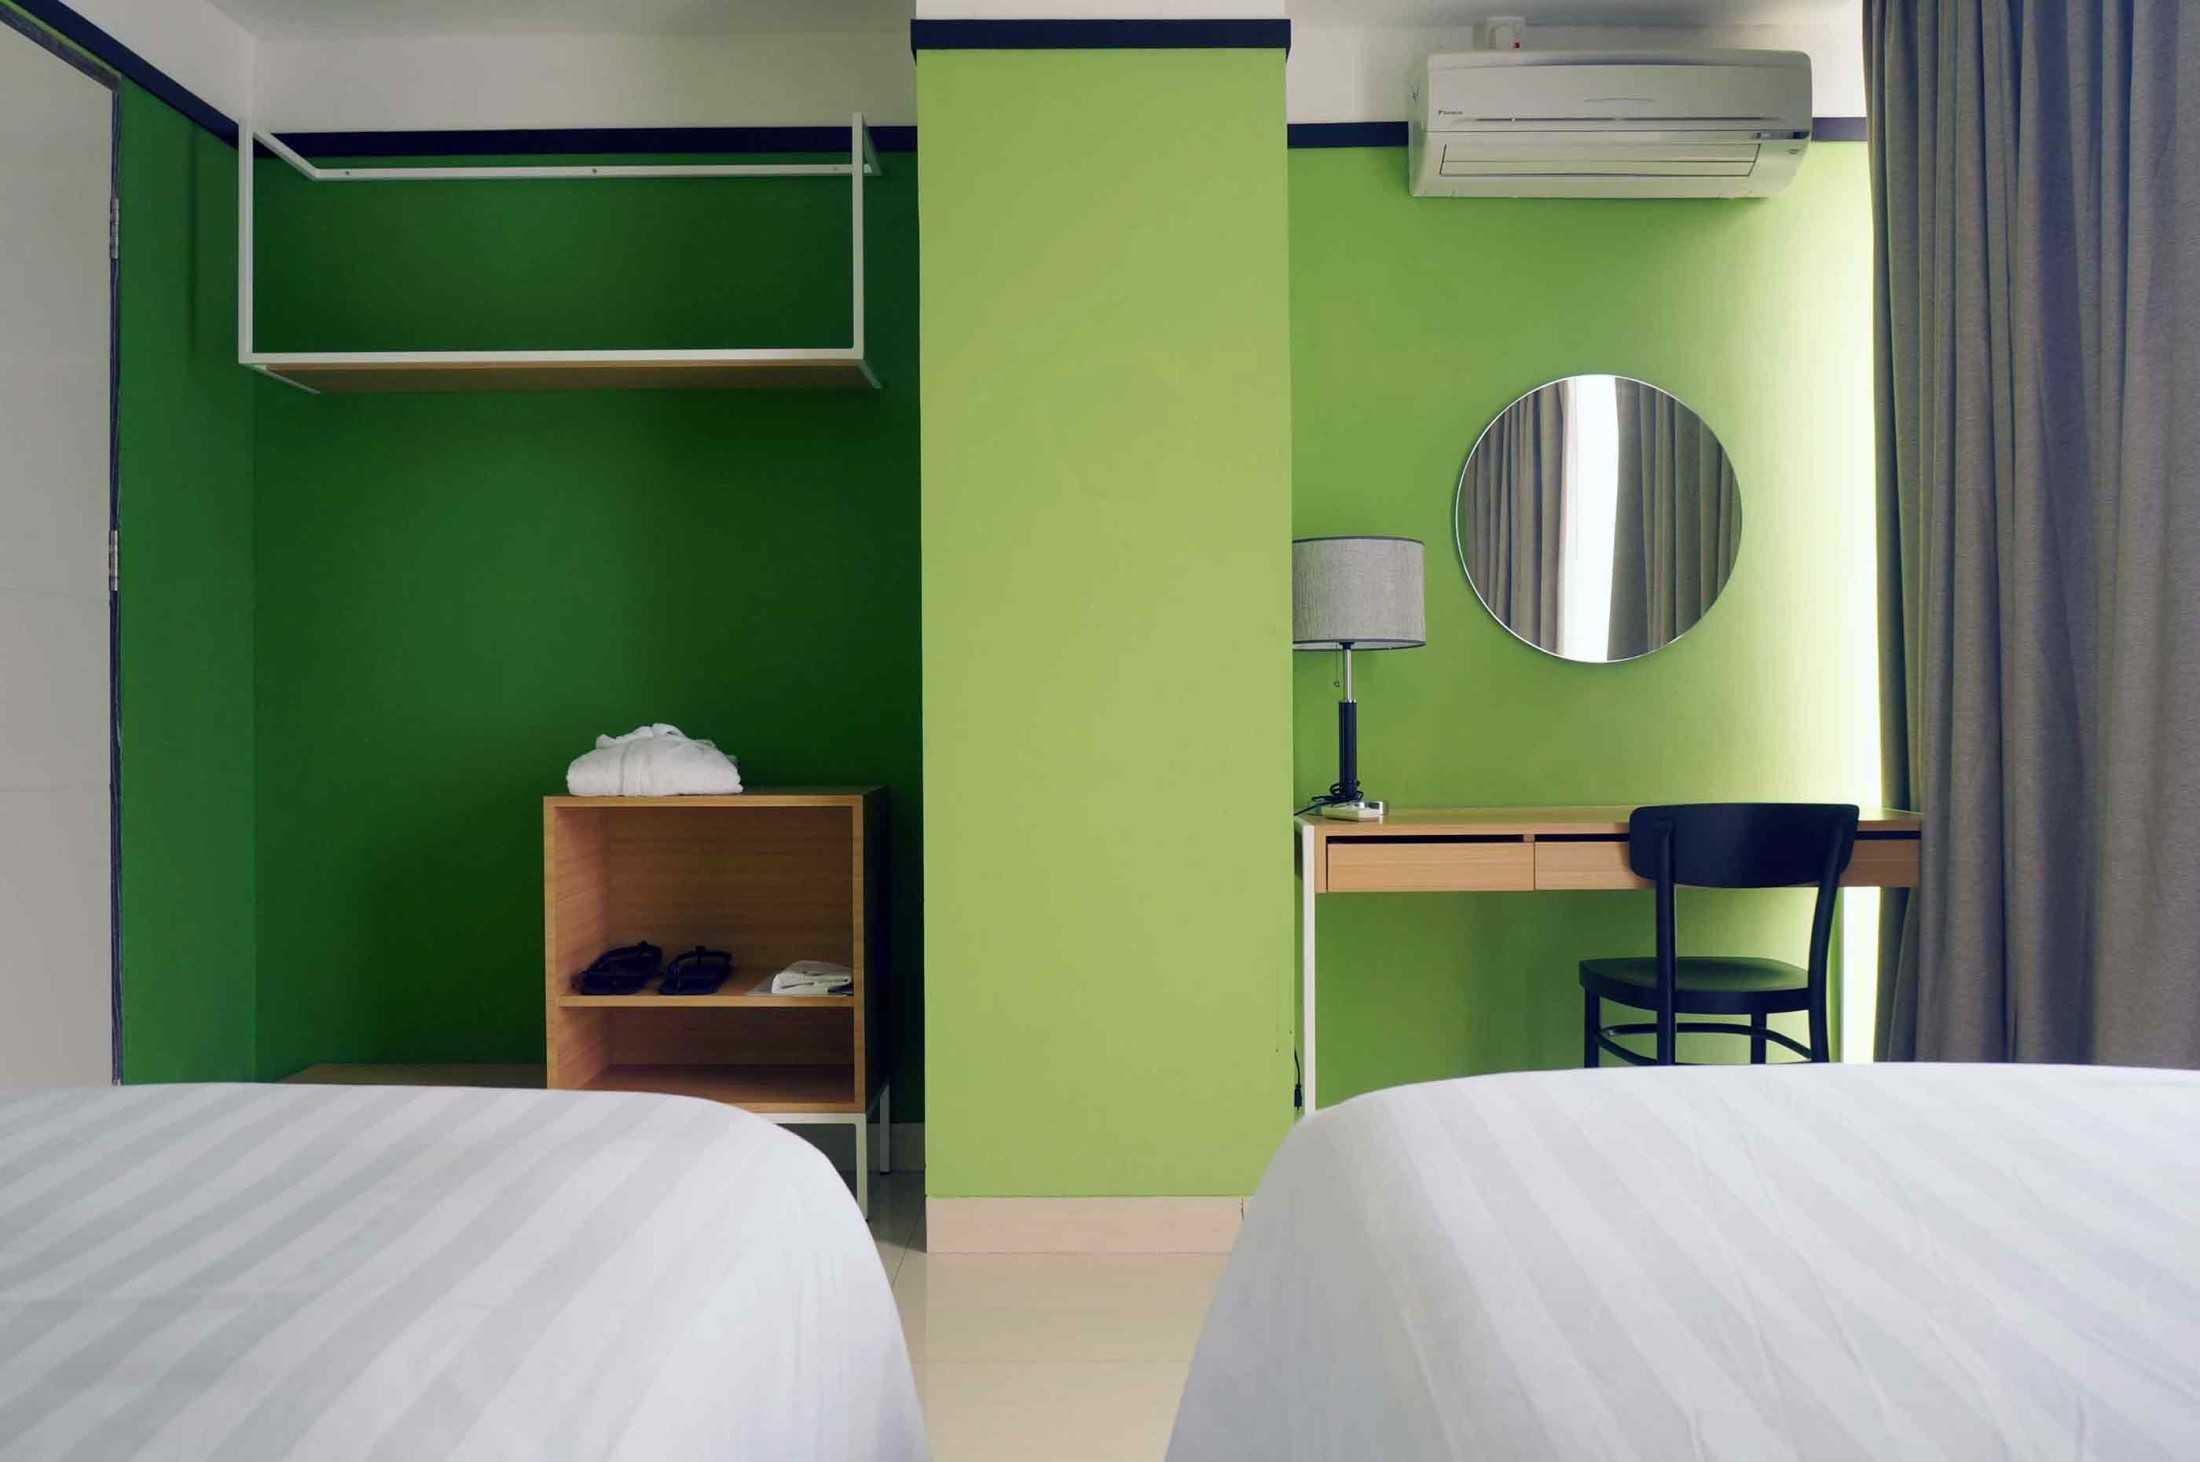 Dinding hijau sebagai focal point di kamar tidur hotel, karya arkitekt.id, via arsitag.com